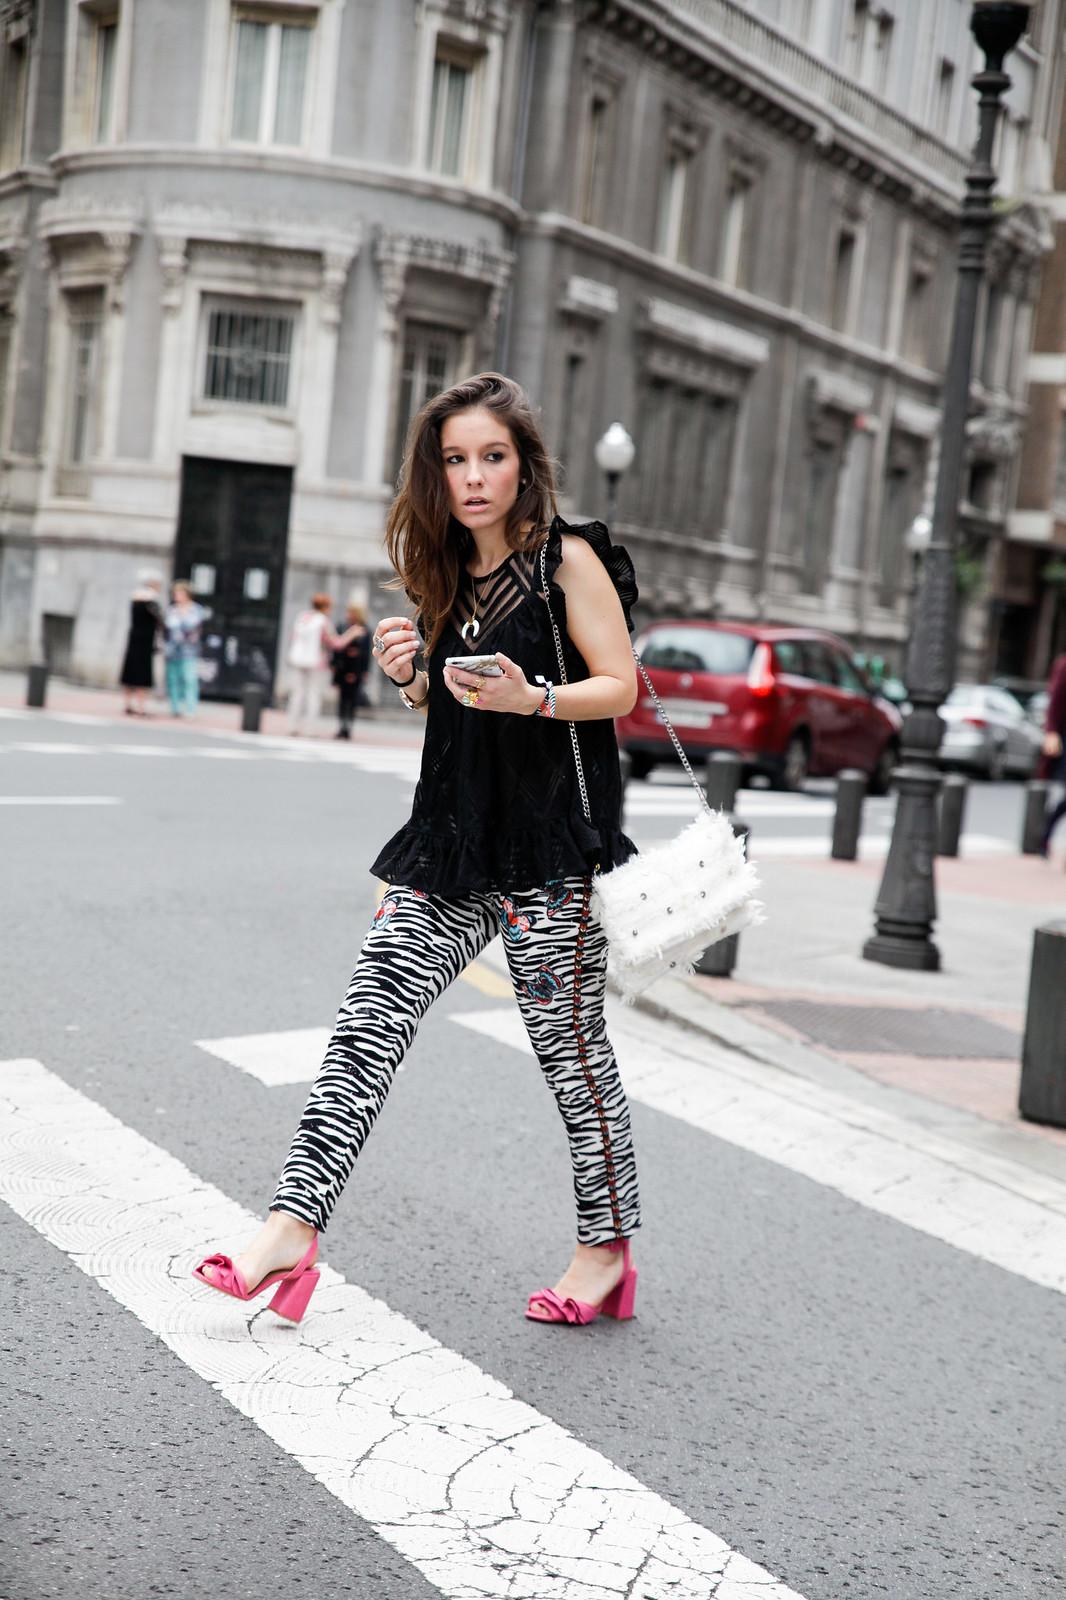 09_Pantalones_Zebra_Blusa_Boho_tacones_rosas_stradivarius_Theguestgirl_outfit_barcelona_streetstyle